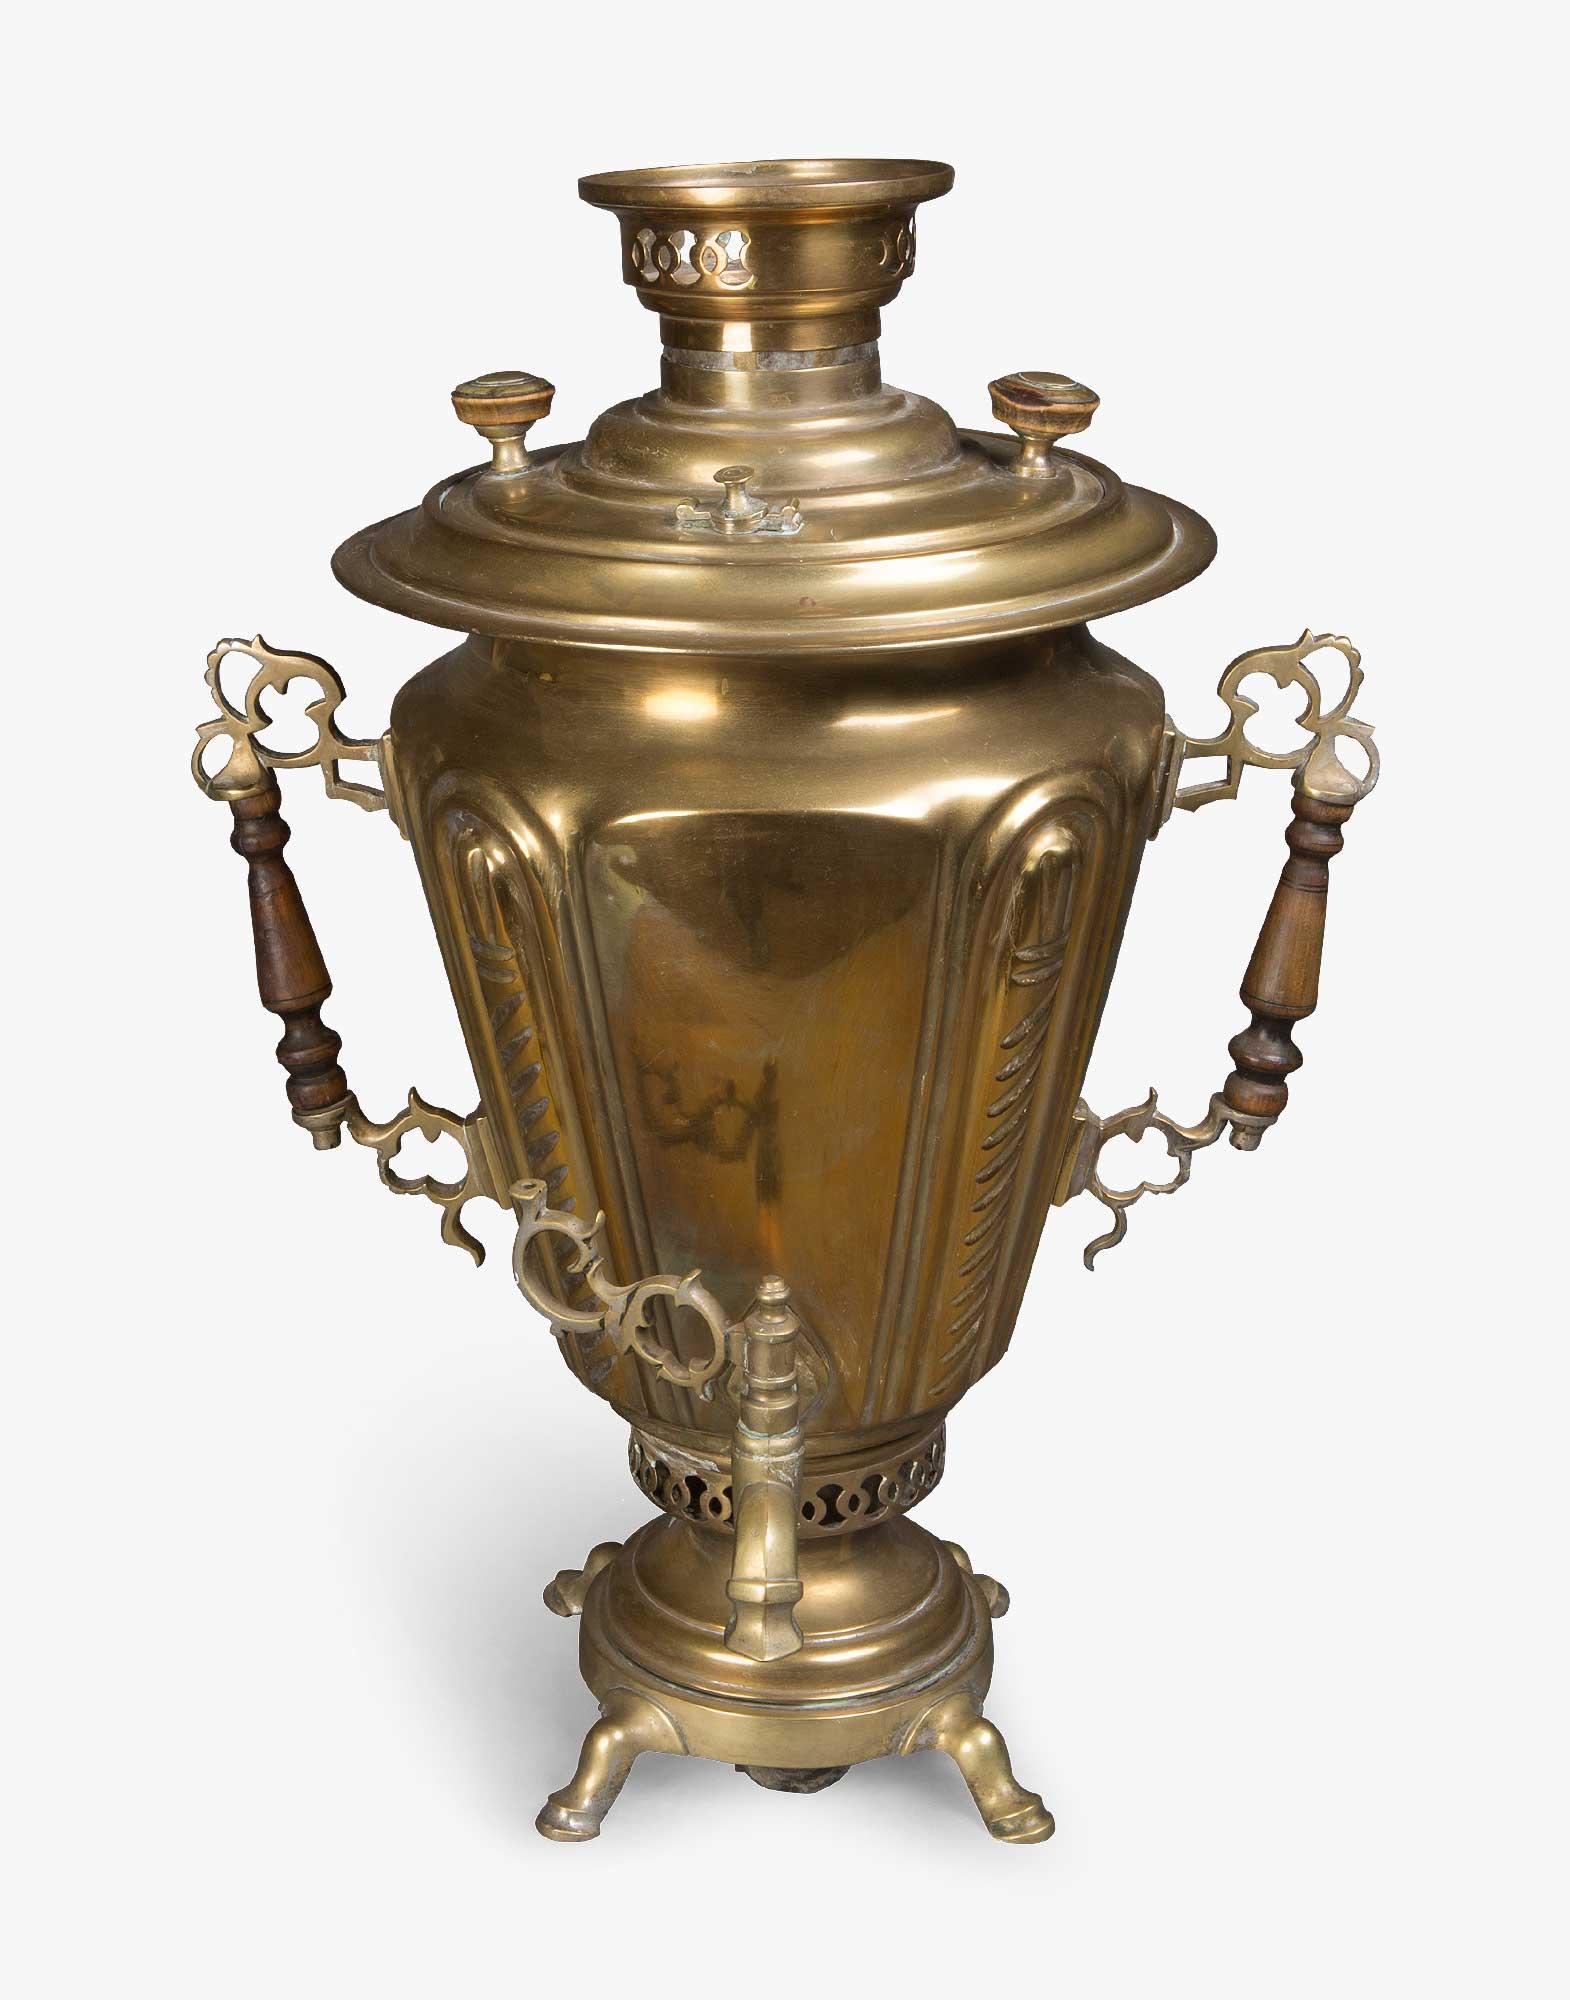 Antique Brass Samovar